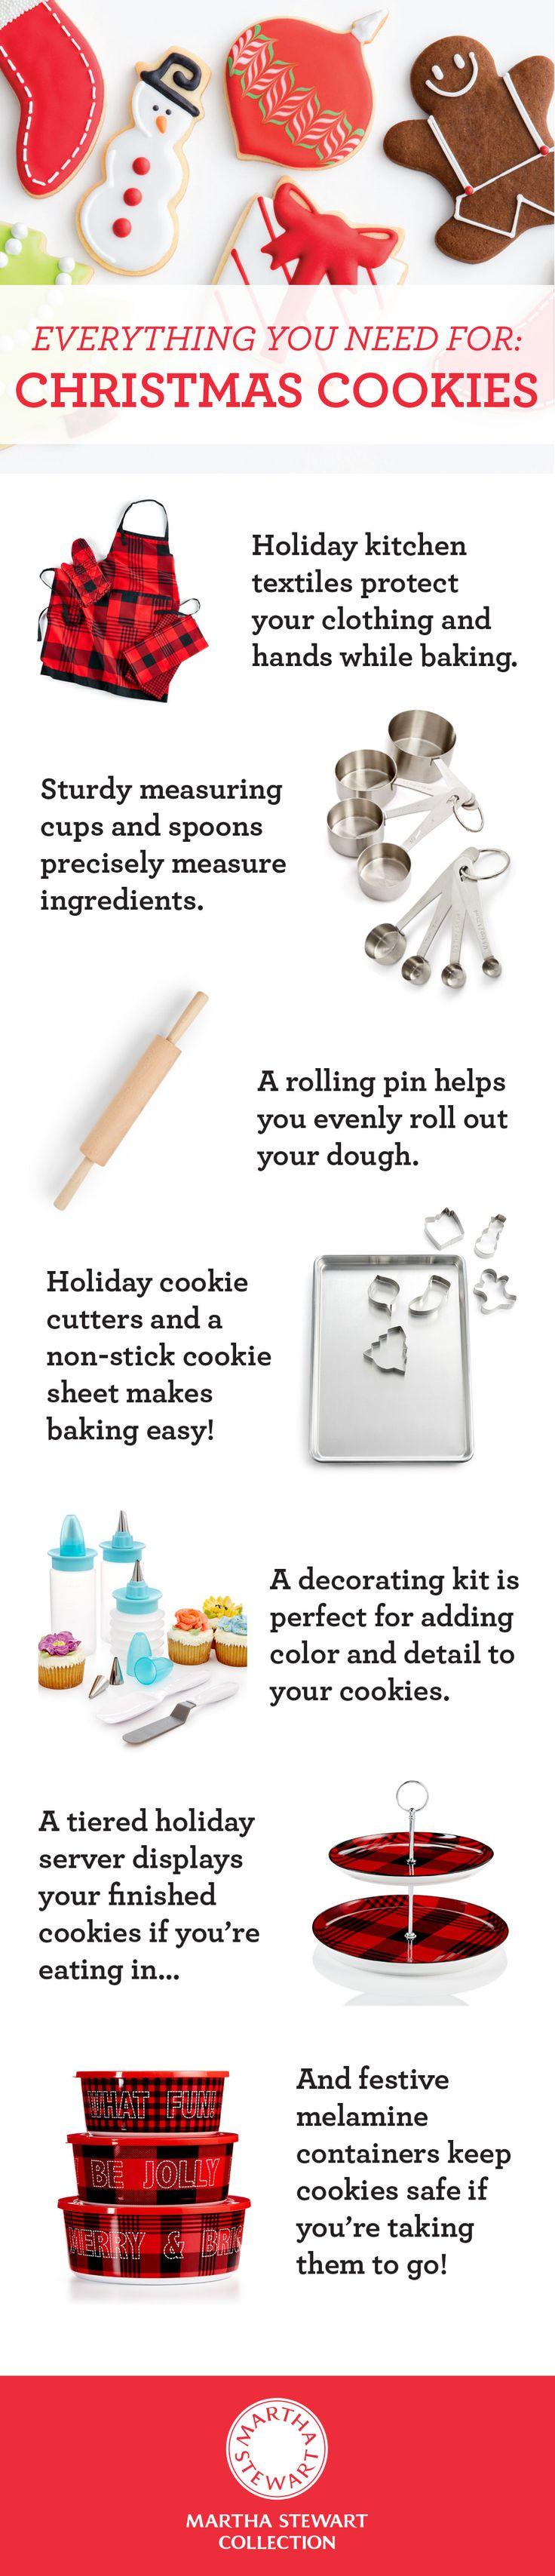 191 best Christmas Cookies images on Pinterest   Christmas cookies ...